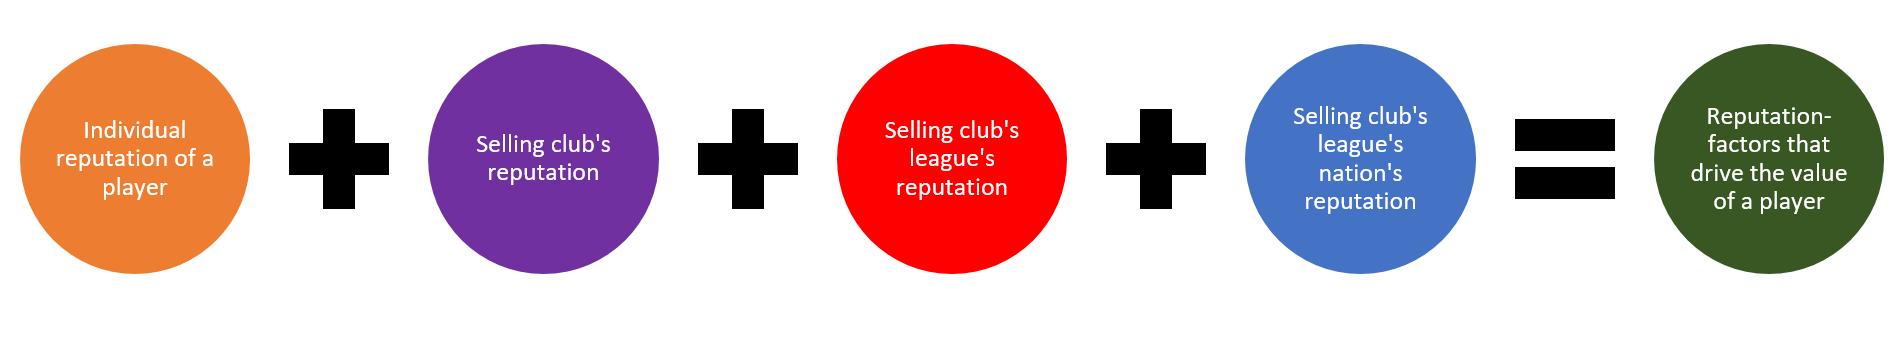 reputation01.png?ssl=1